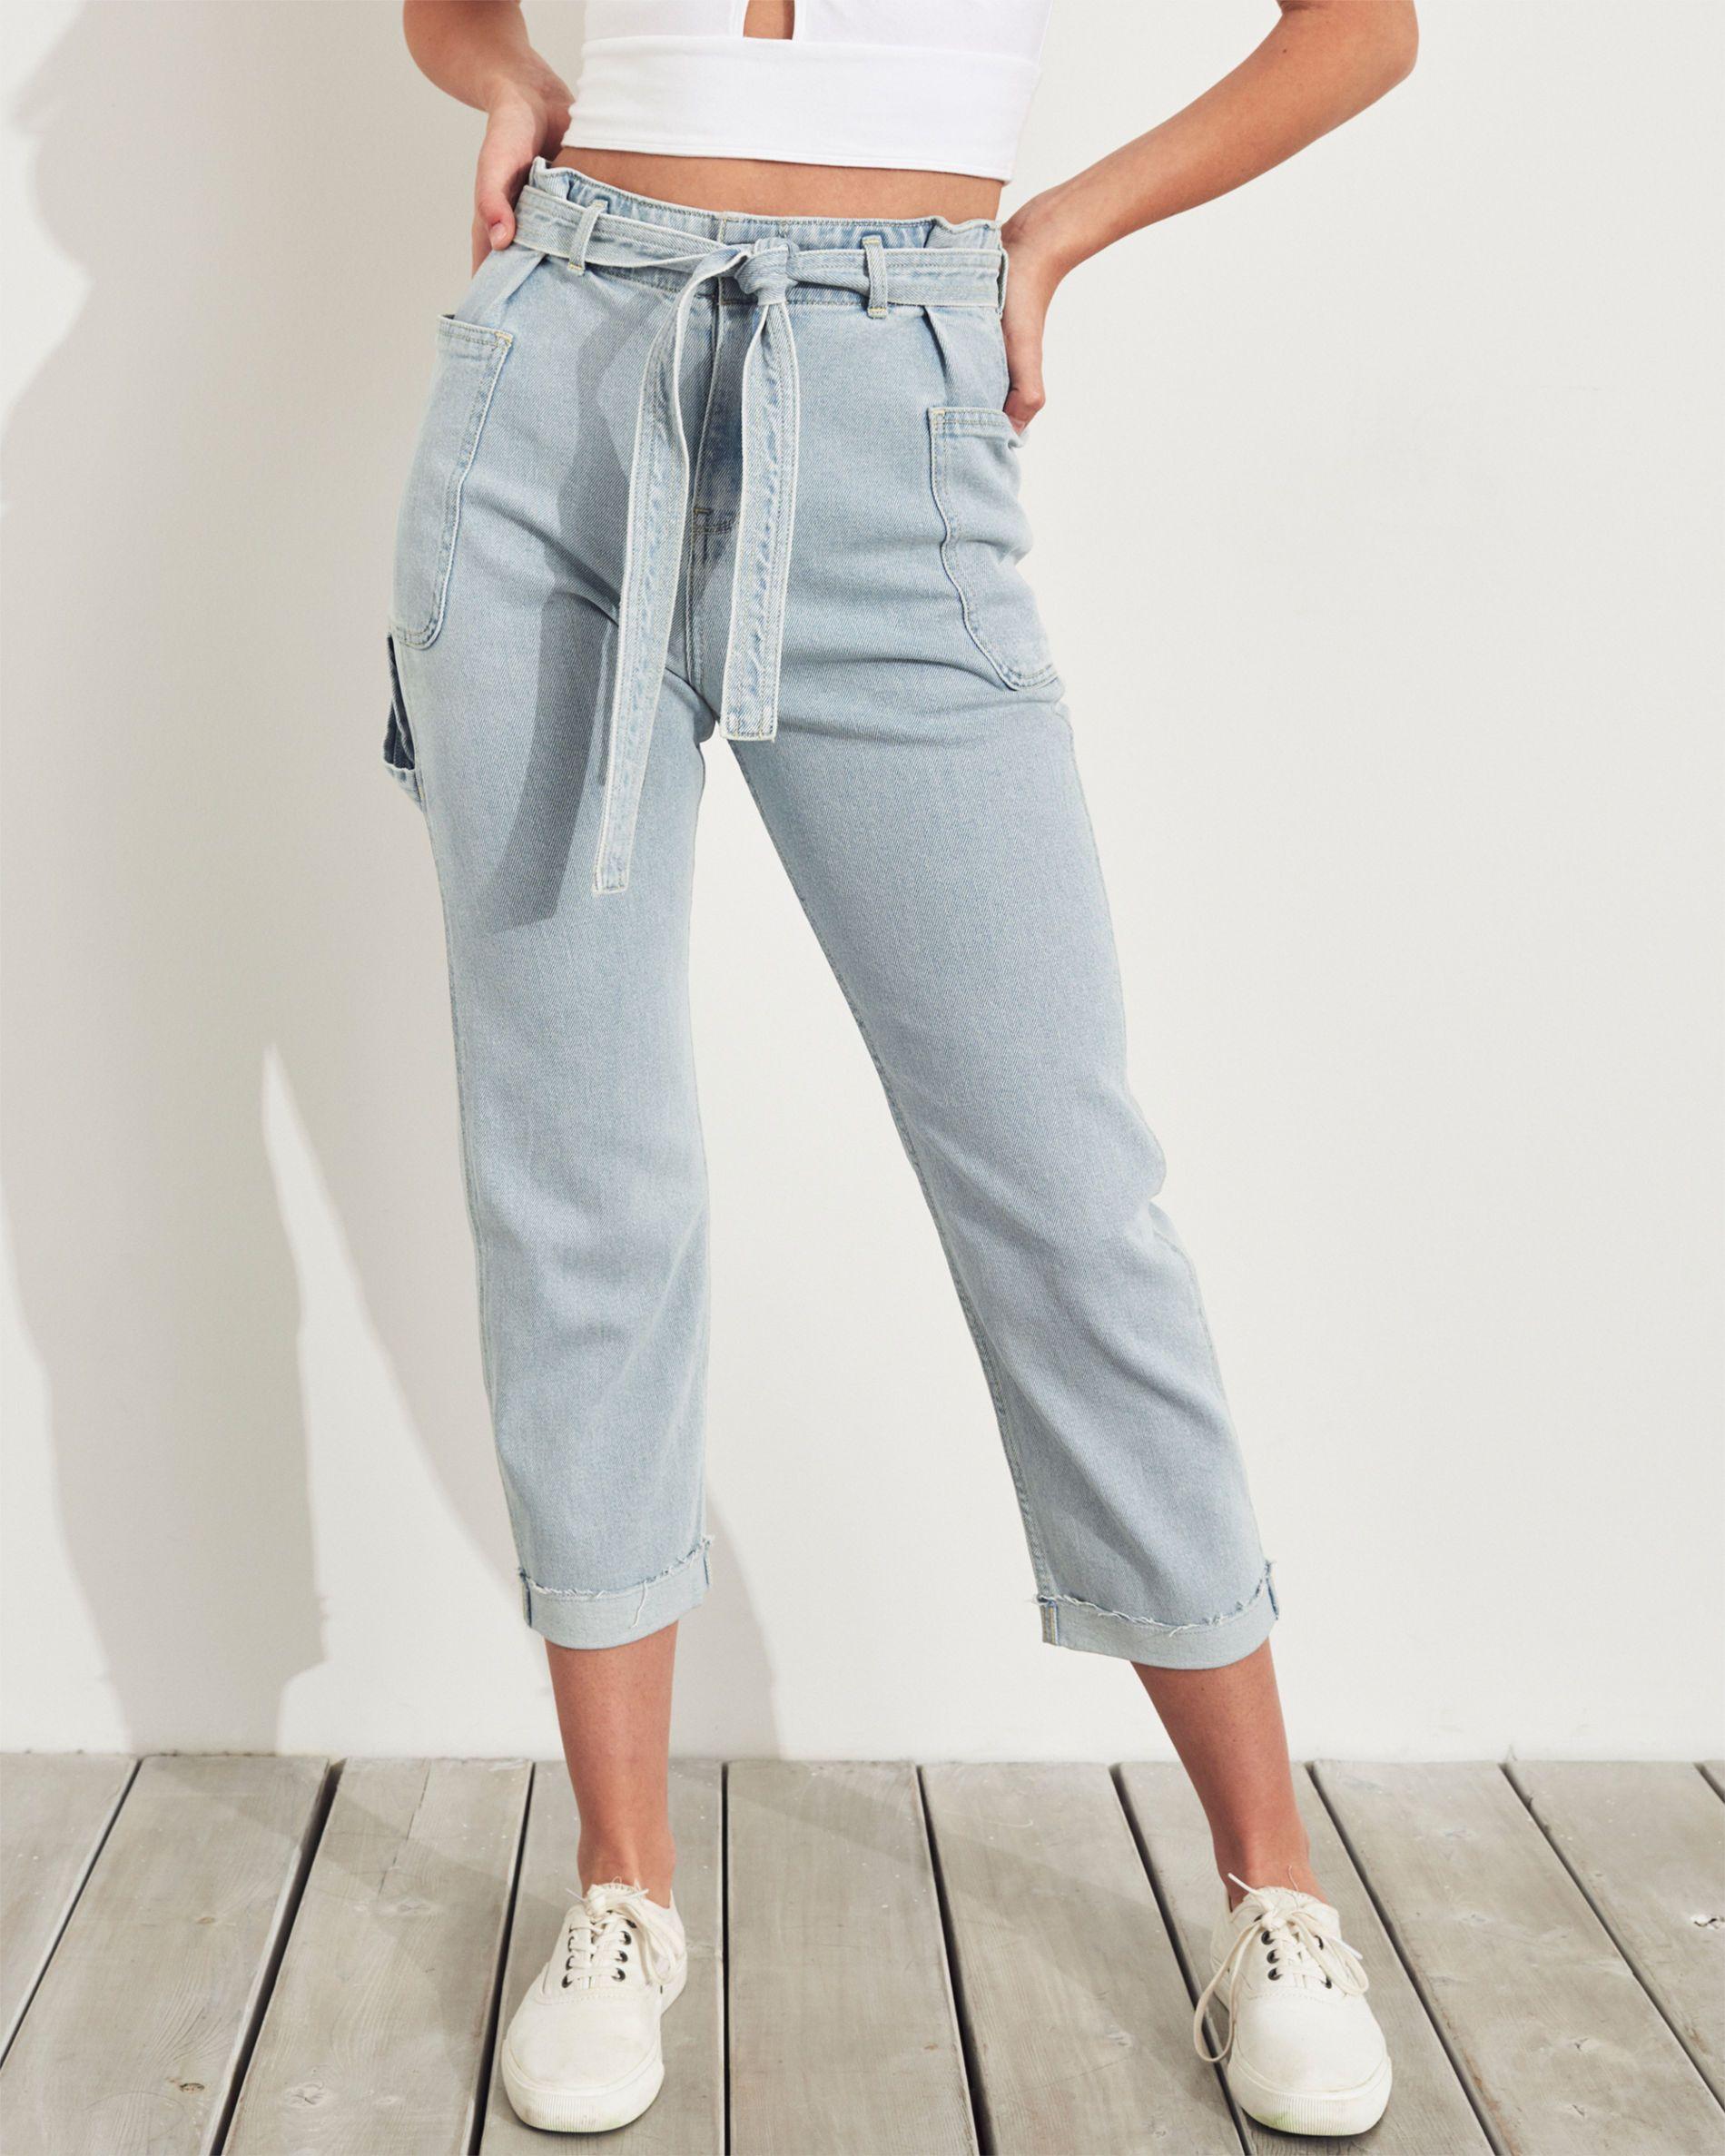 Girls Vintage Stretch High-Rise Boyfriend Jeans   Girls New Arrivals    HollisterCo.com   High rise boyfriend jeans, Boyfriend jeans, Light jeans